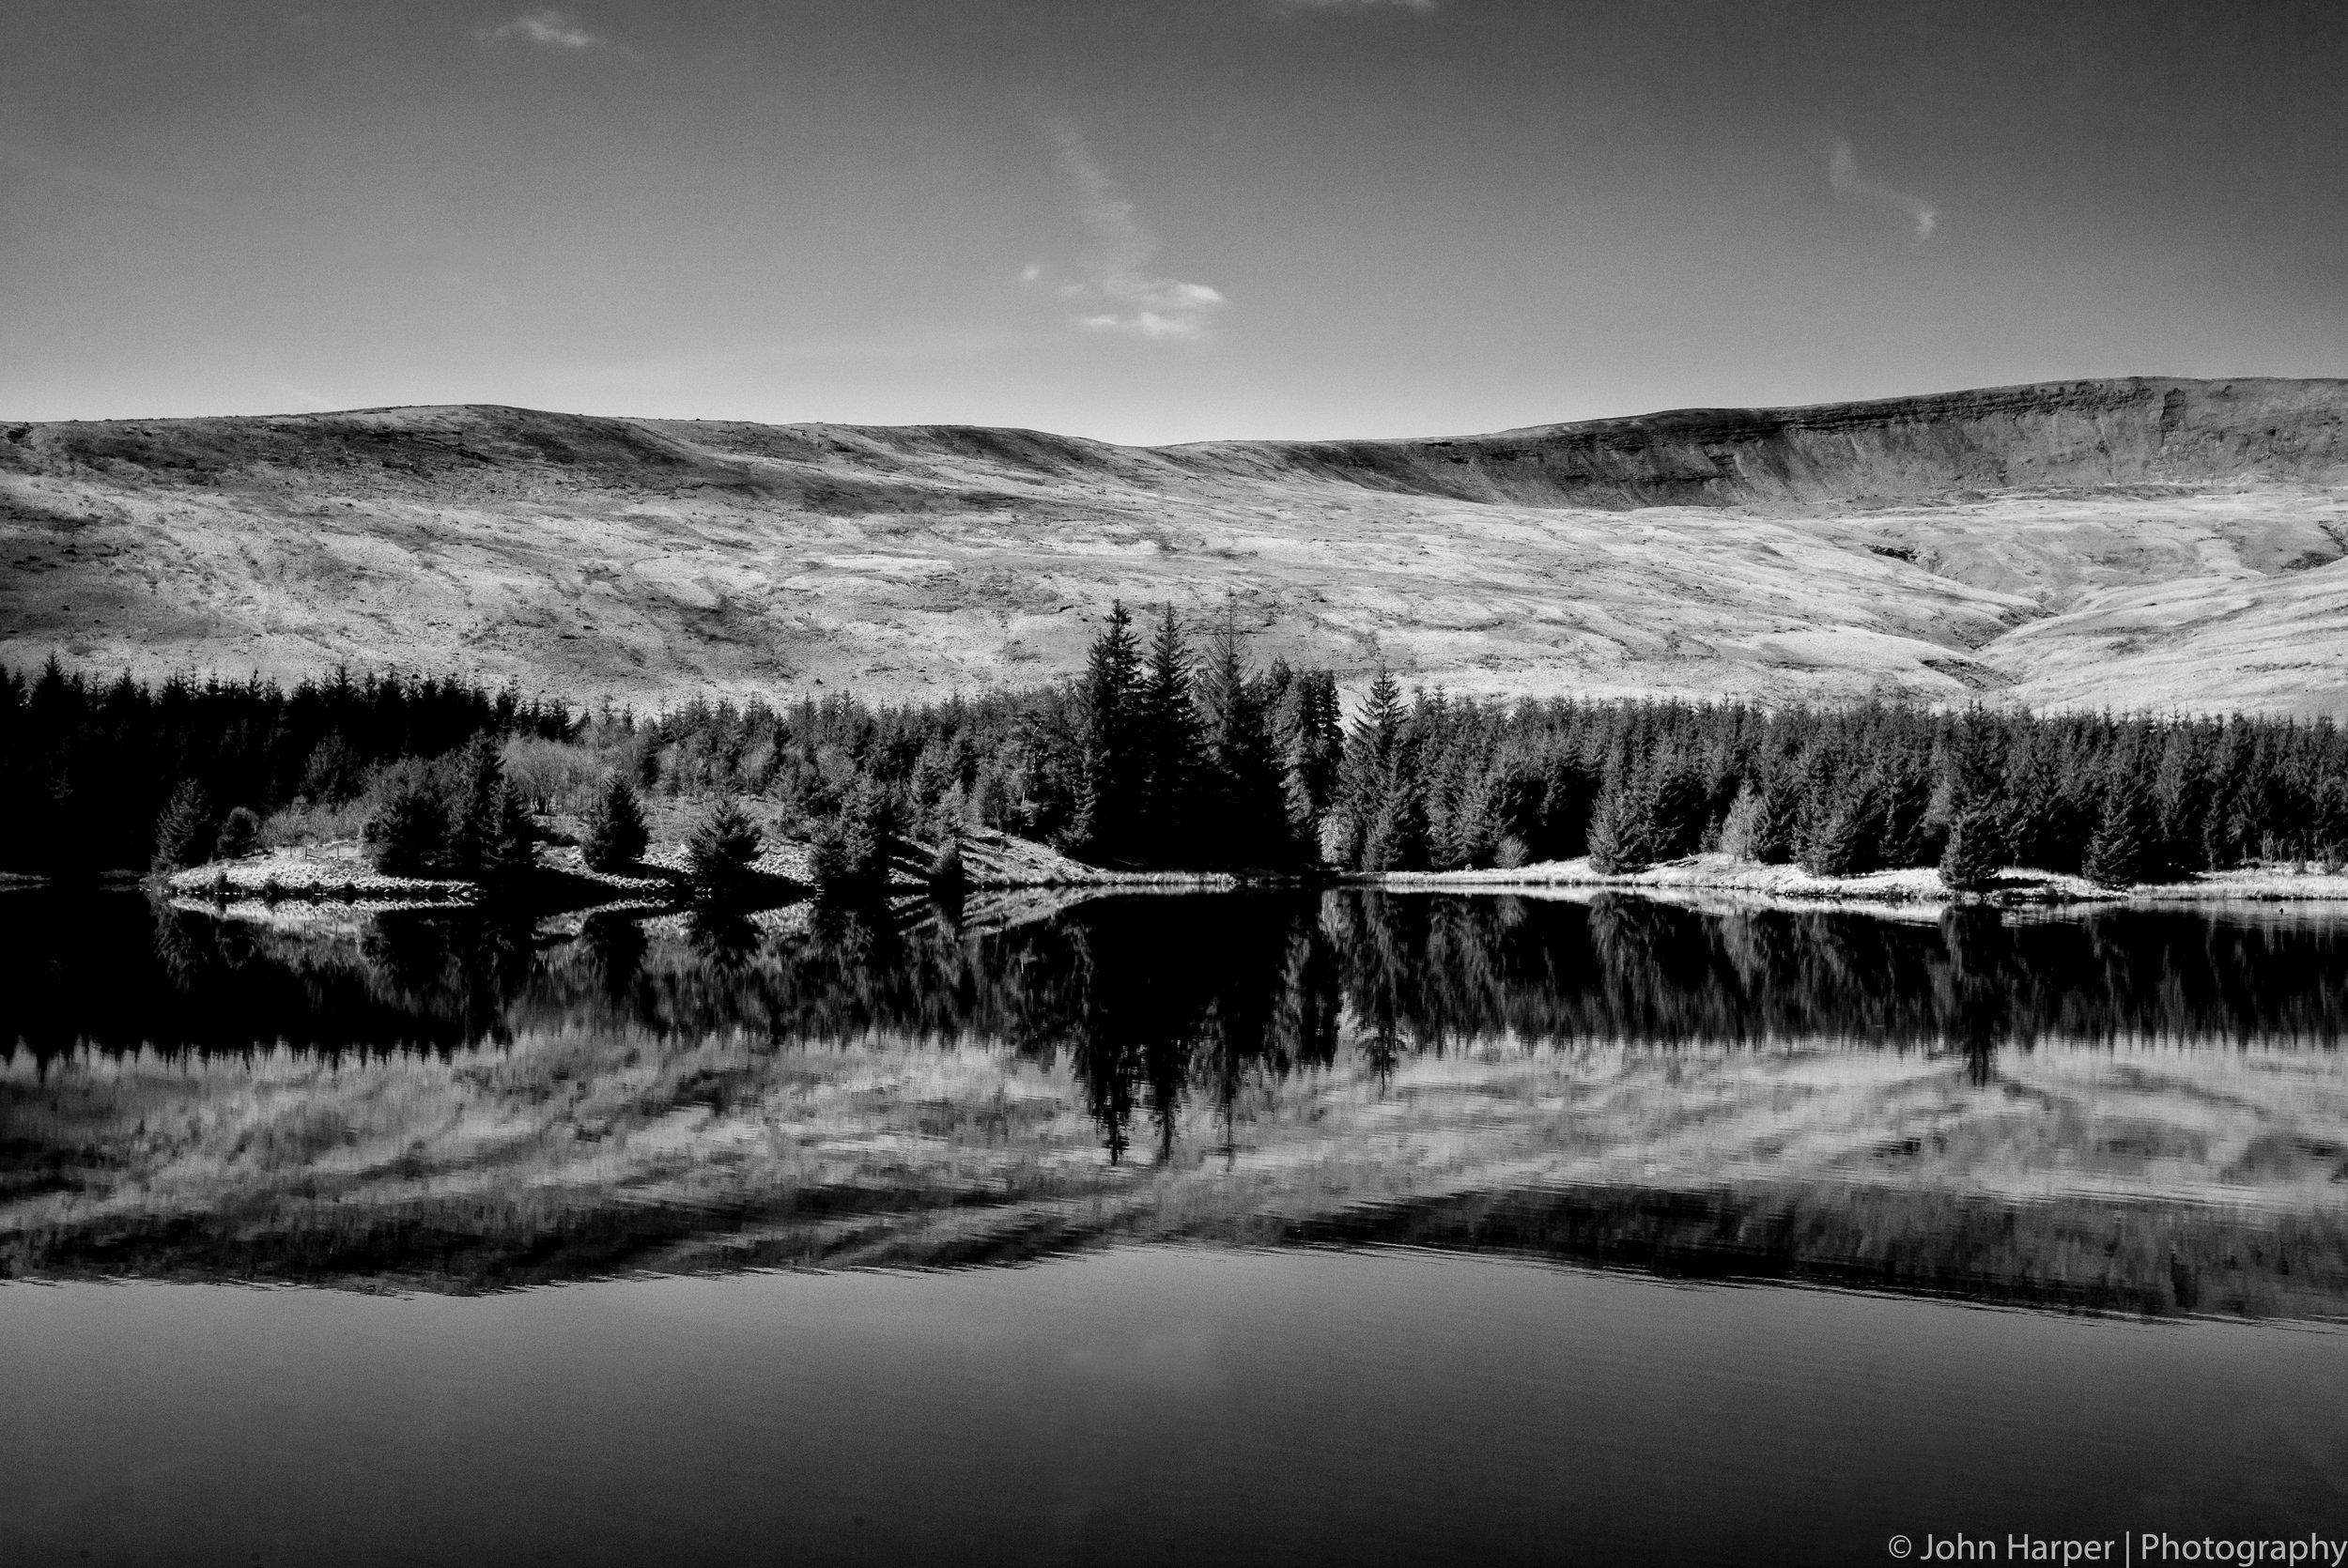 Rorschach Test - I see a lake!